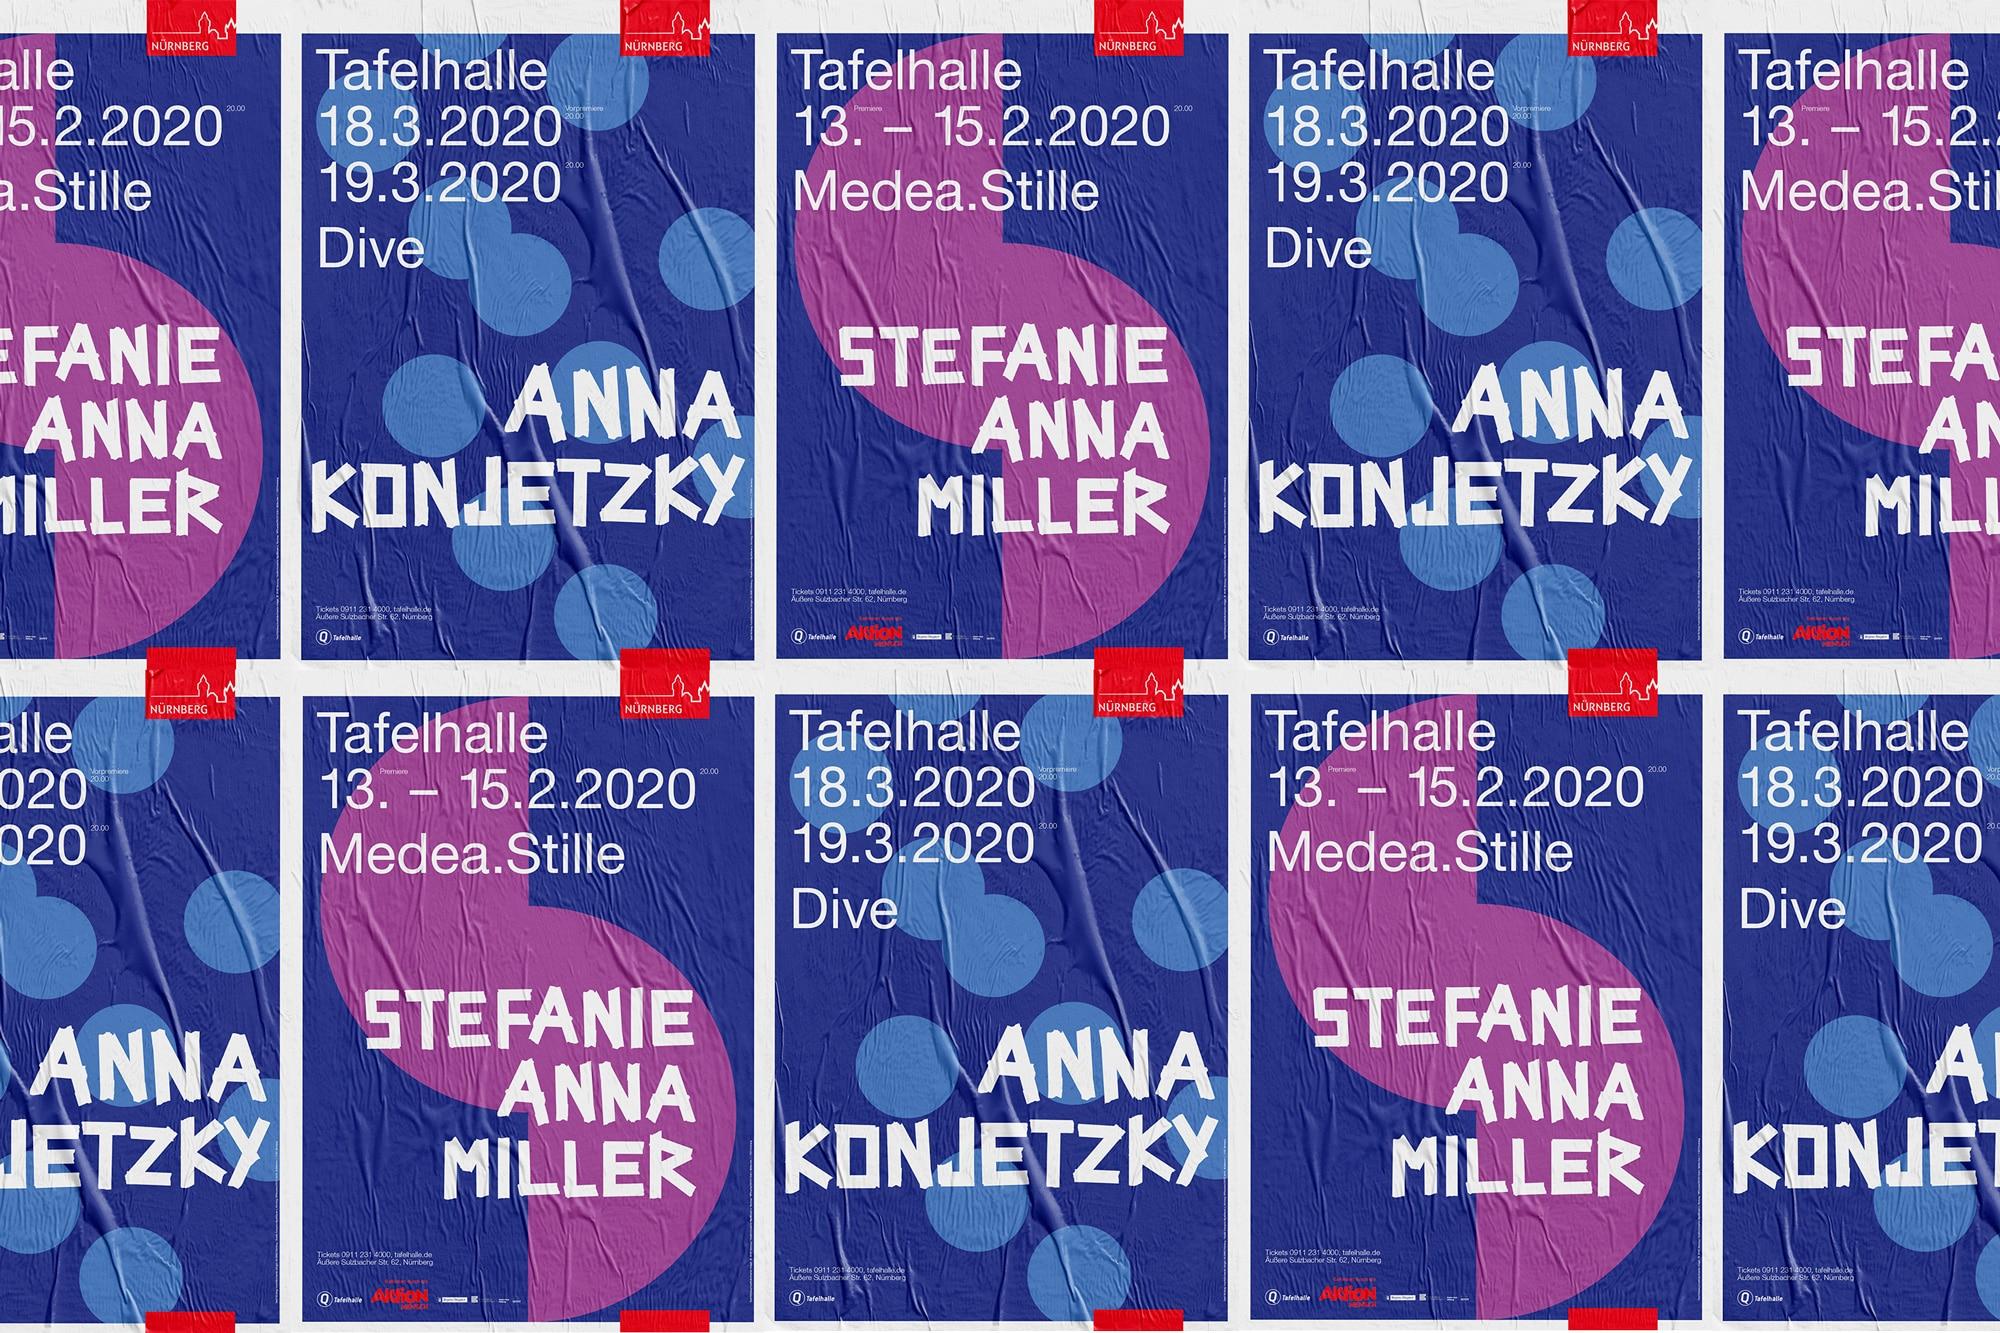 planx-Tafelhalle-2019-20-Poster-06